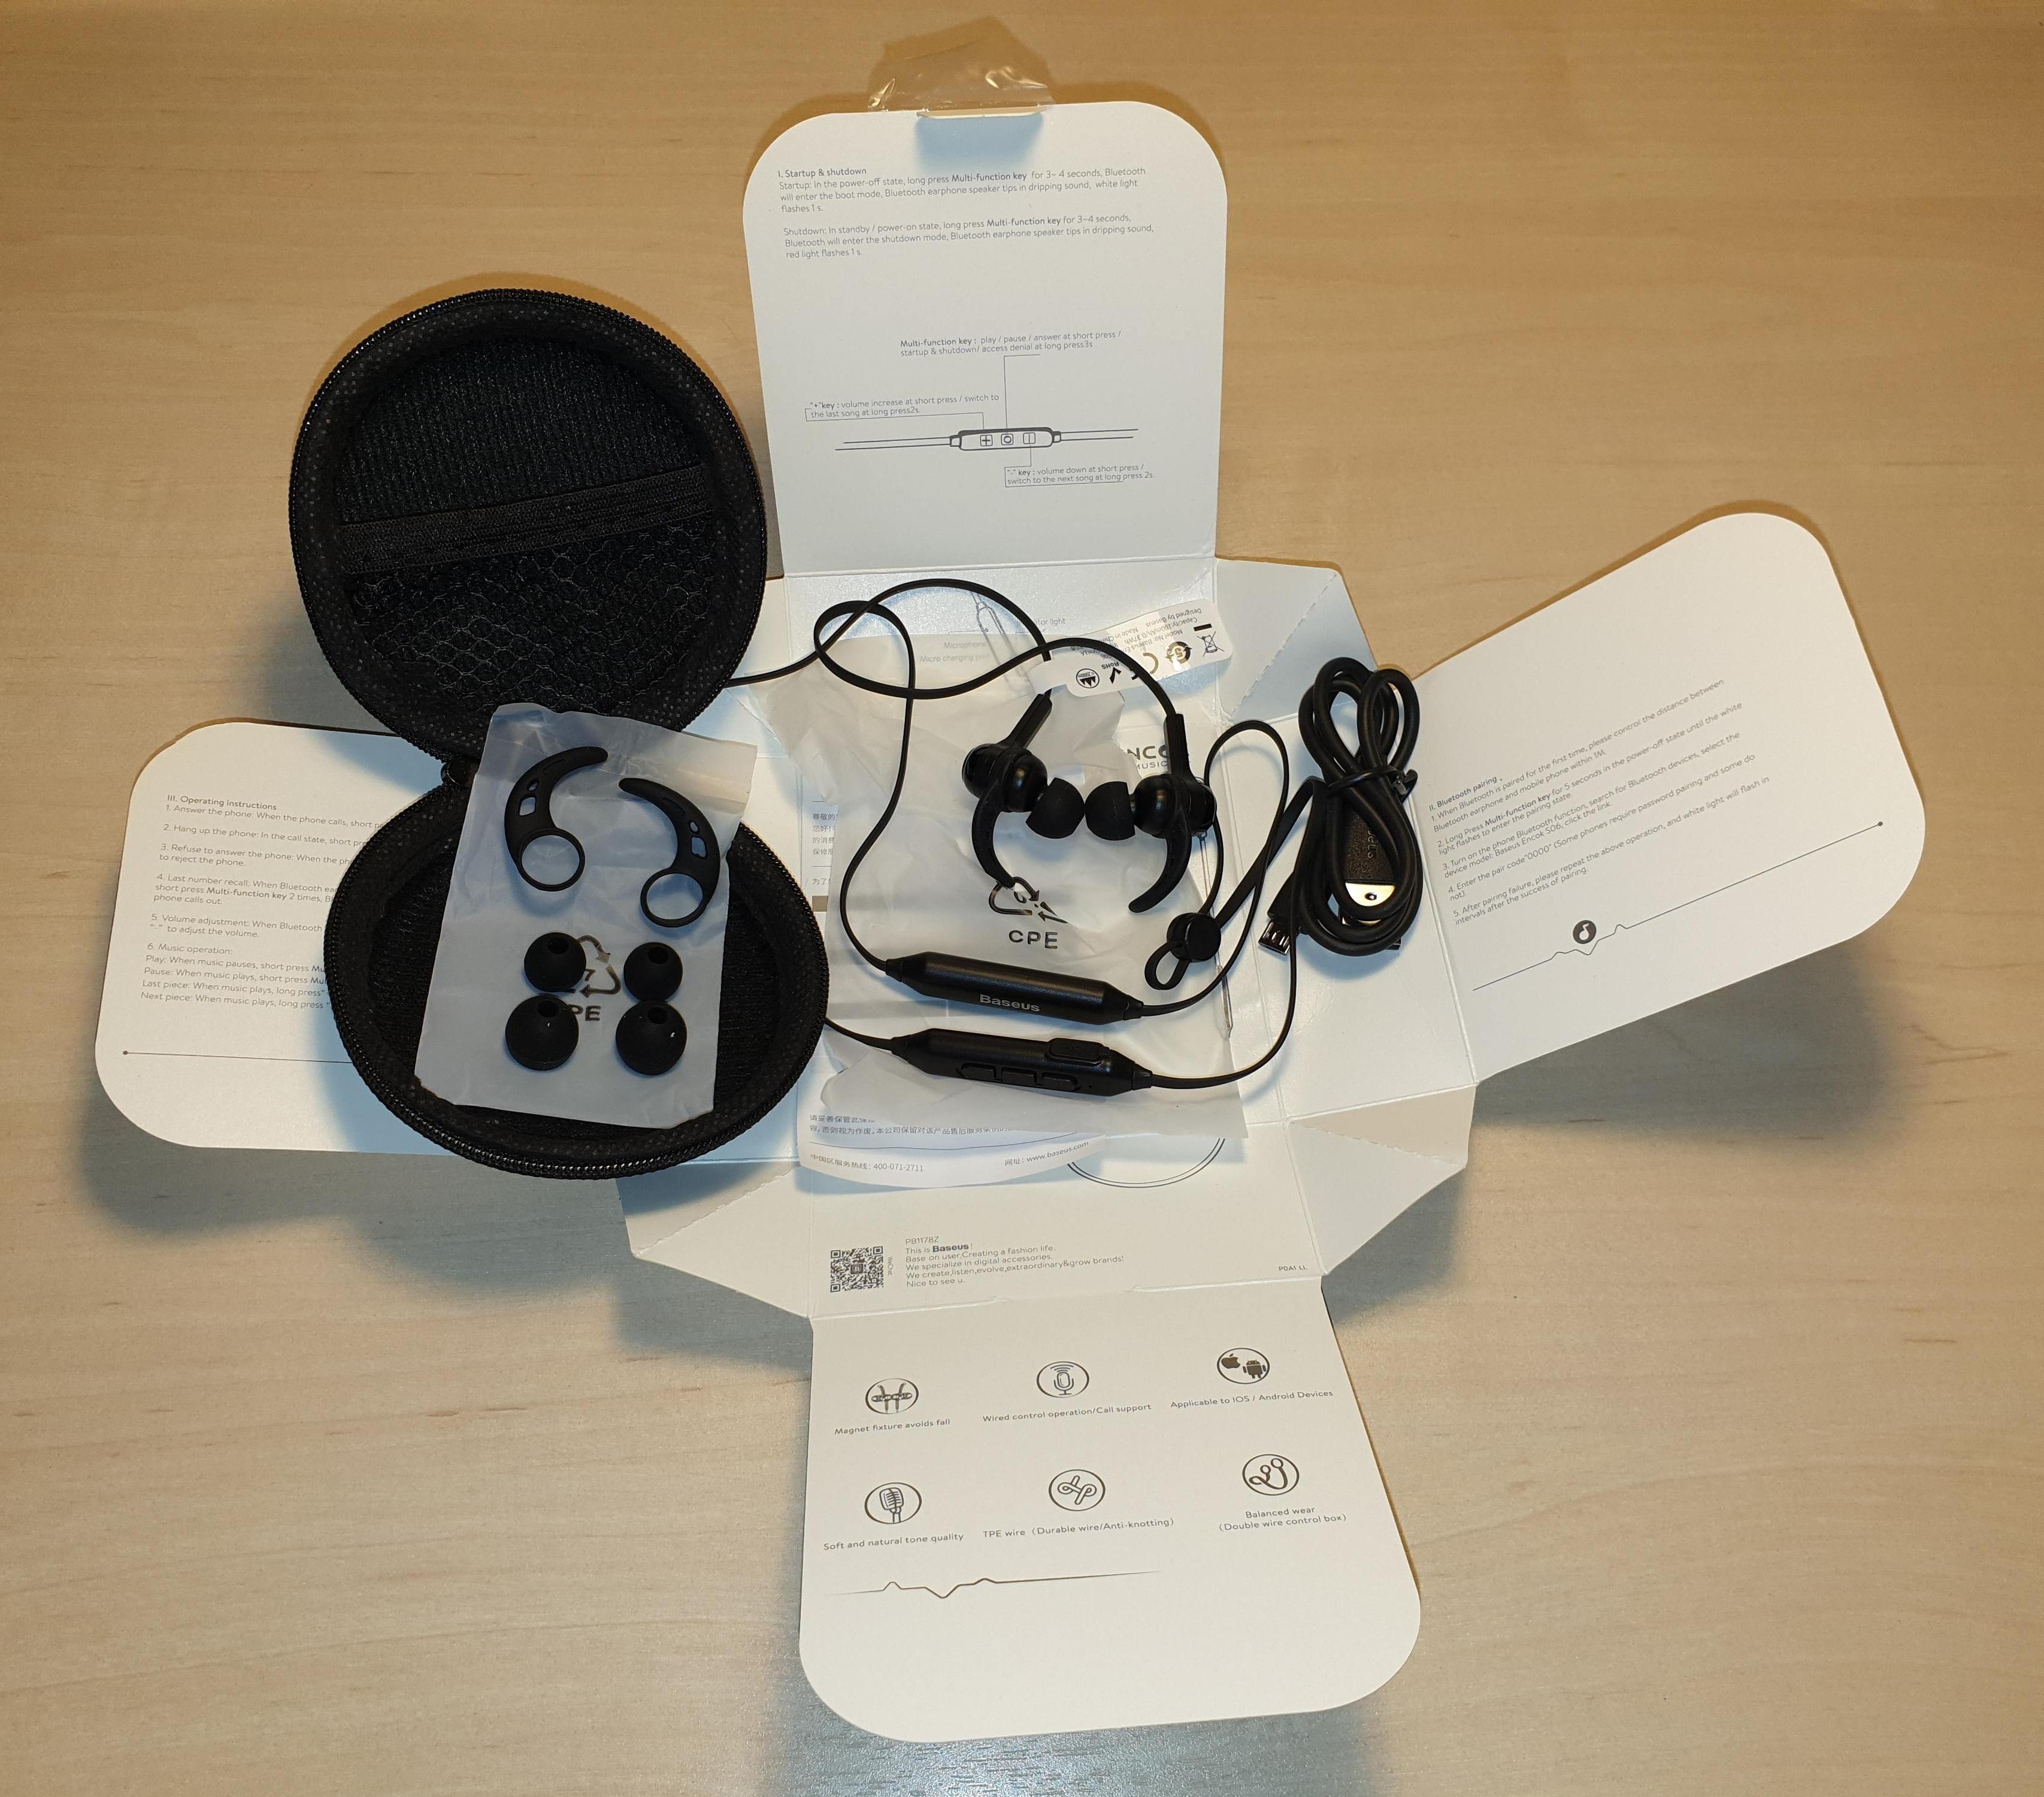 Baseus S06 Bluetooth Earphone Wireless Magnetic Neckband Bluetooth Headset Sport Earphone Stereo Earpieces For Samsung Xiaomi|Phone Earphones & Headphones| |  - AliExpress